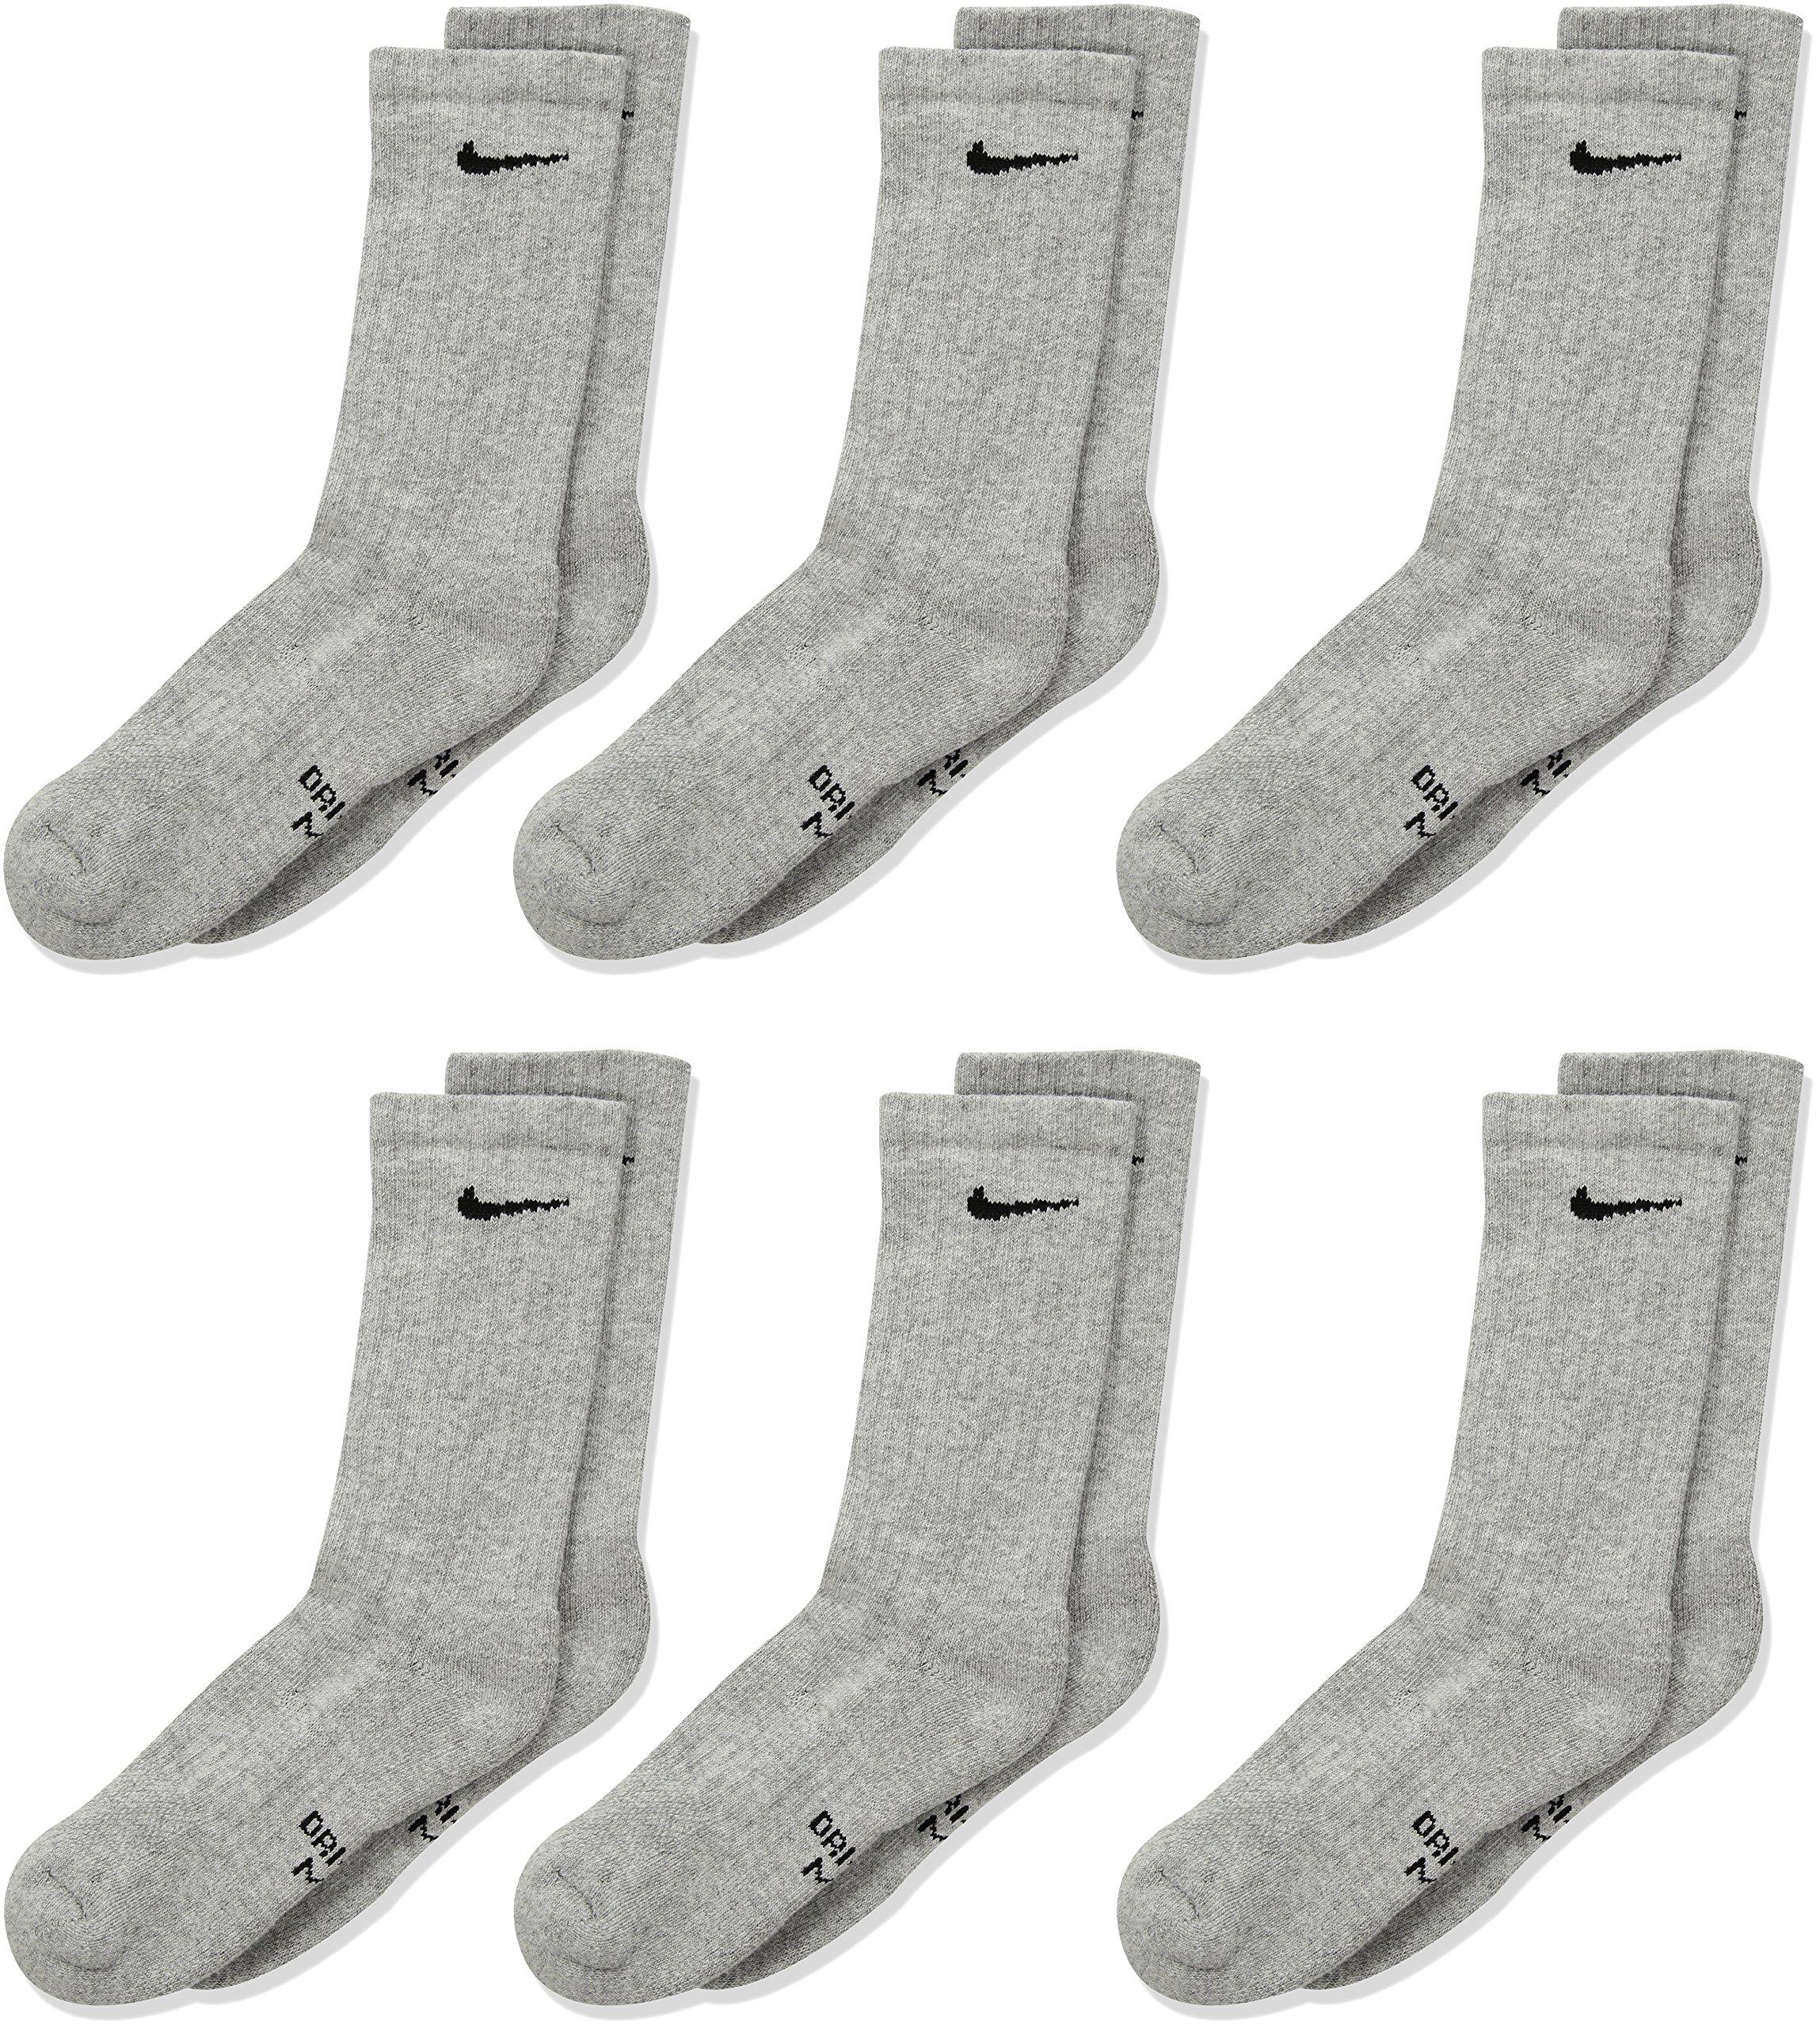 Nike Kids' Performance Cushioned Crew Training Socks (6 Pair), Girls & Boys' Socks with Cushioned Comfort & Dri-FIT Technology, Dark Grey Heather/Black, M by Nike